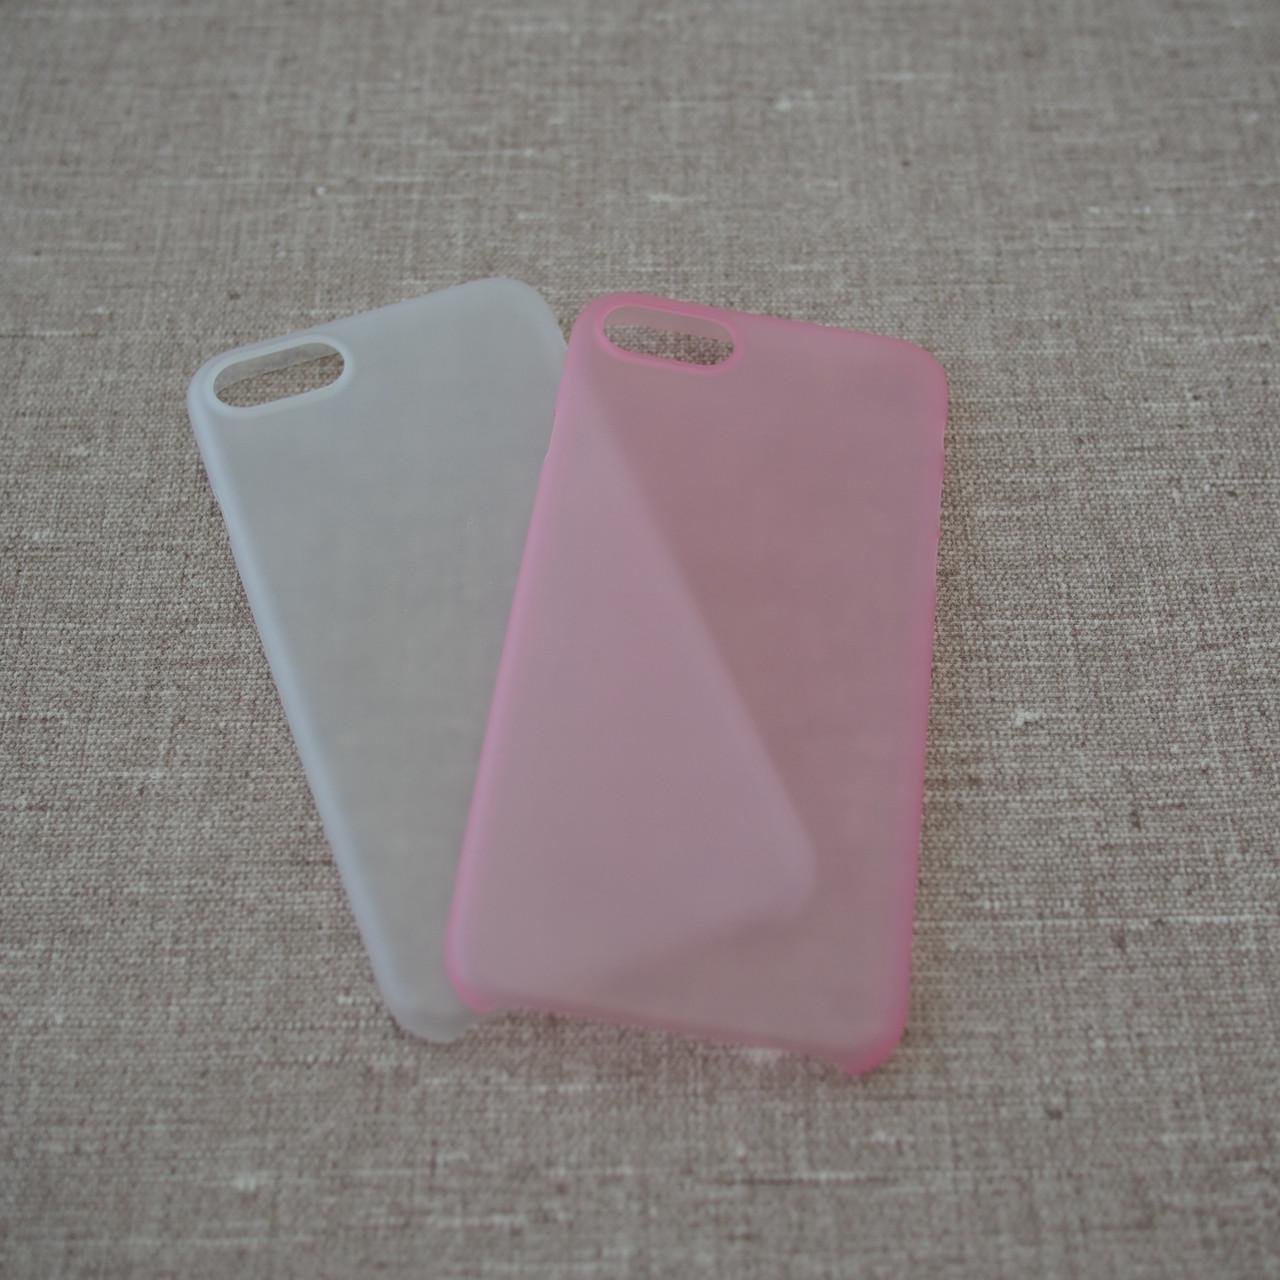 "Чохол Ozaki O! Coat 0.3 iPhone 8/7 {4.7 ""} Jelly 2 in 1 clear / pink (OC720CP) EAN / UPC: 4718971720037"